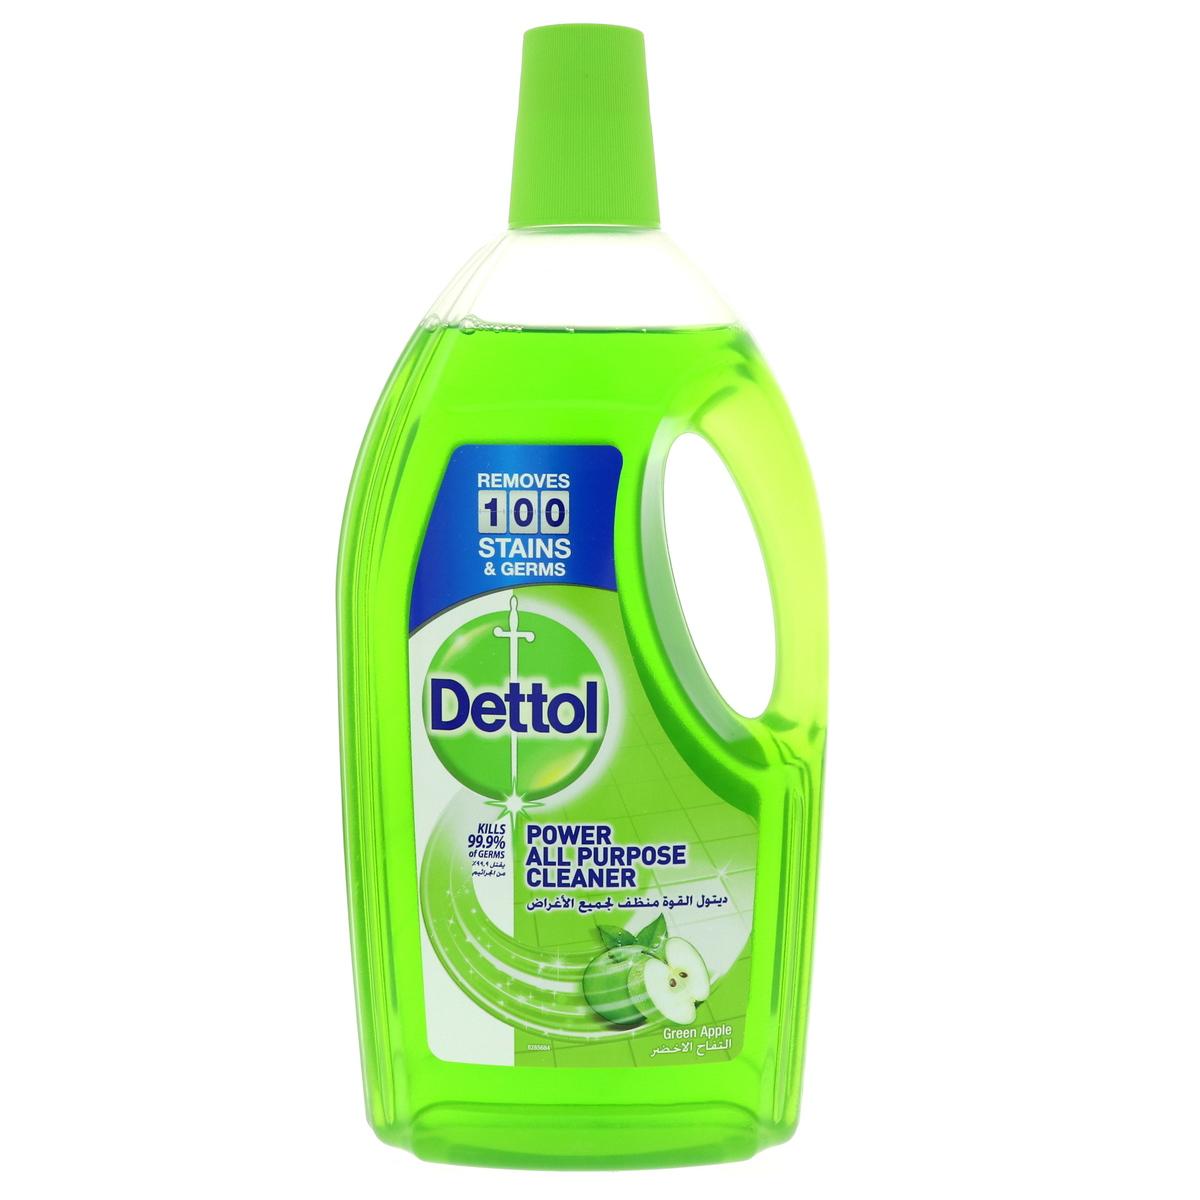 Dettol Power All-Purpose Cleaner Green Apple - 900ml (pc)